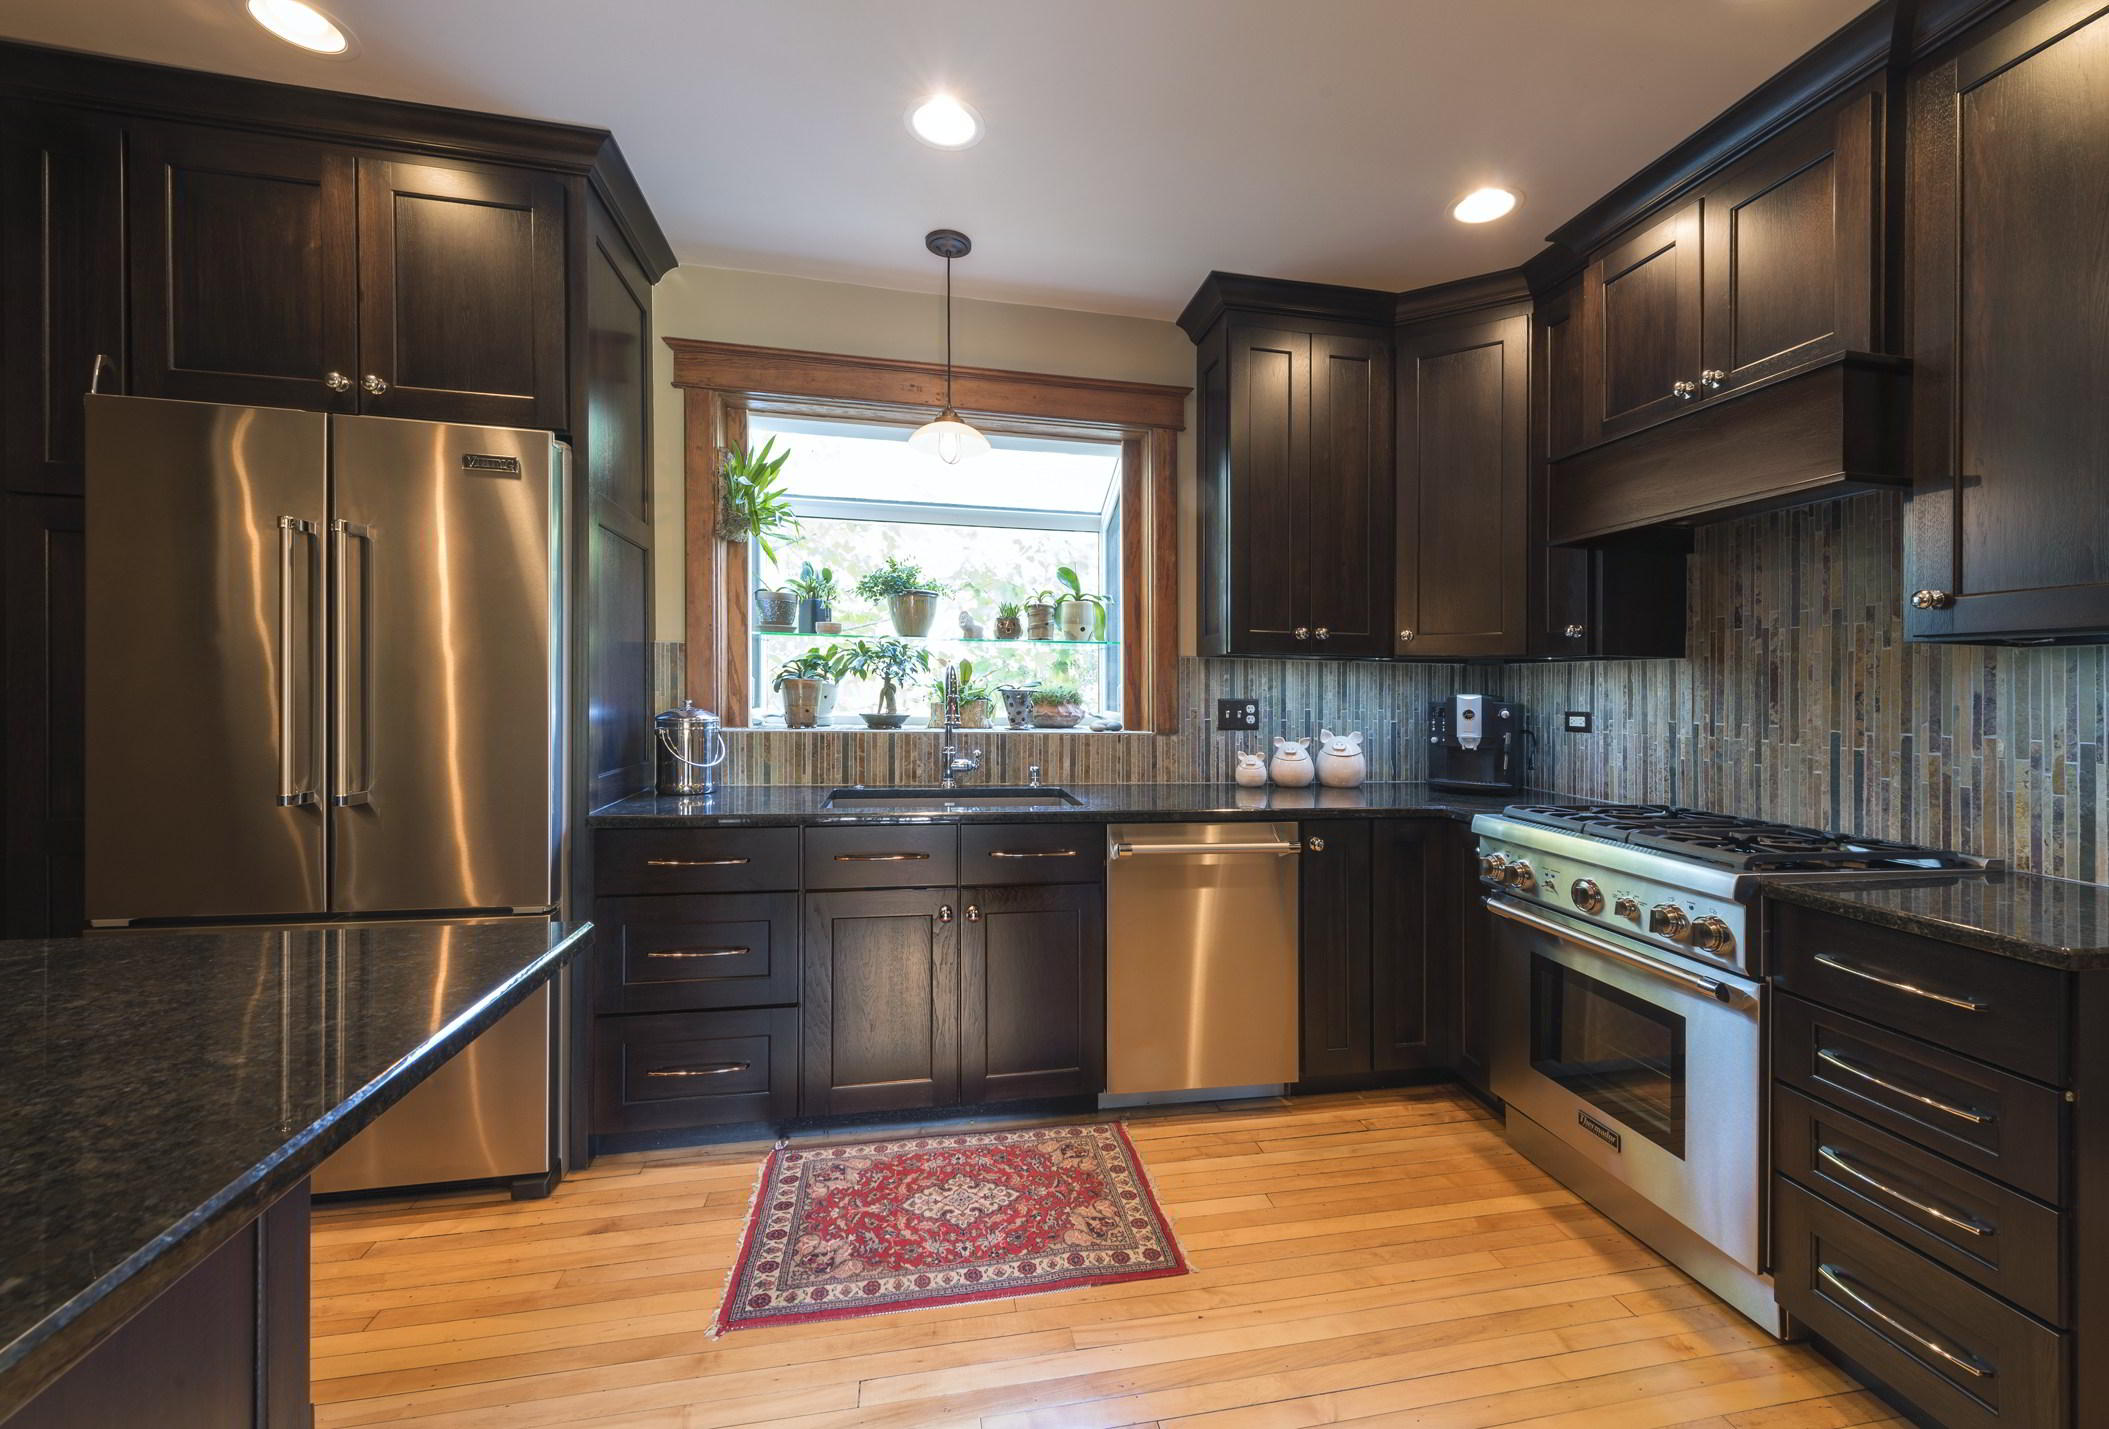 Kitchen Design Portfolio Expert Design & Build